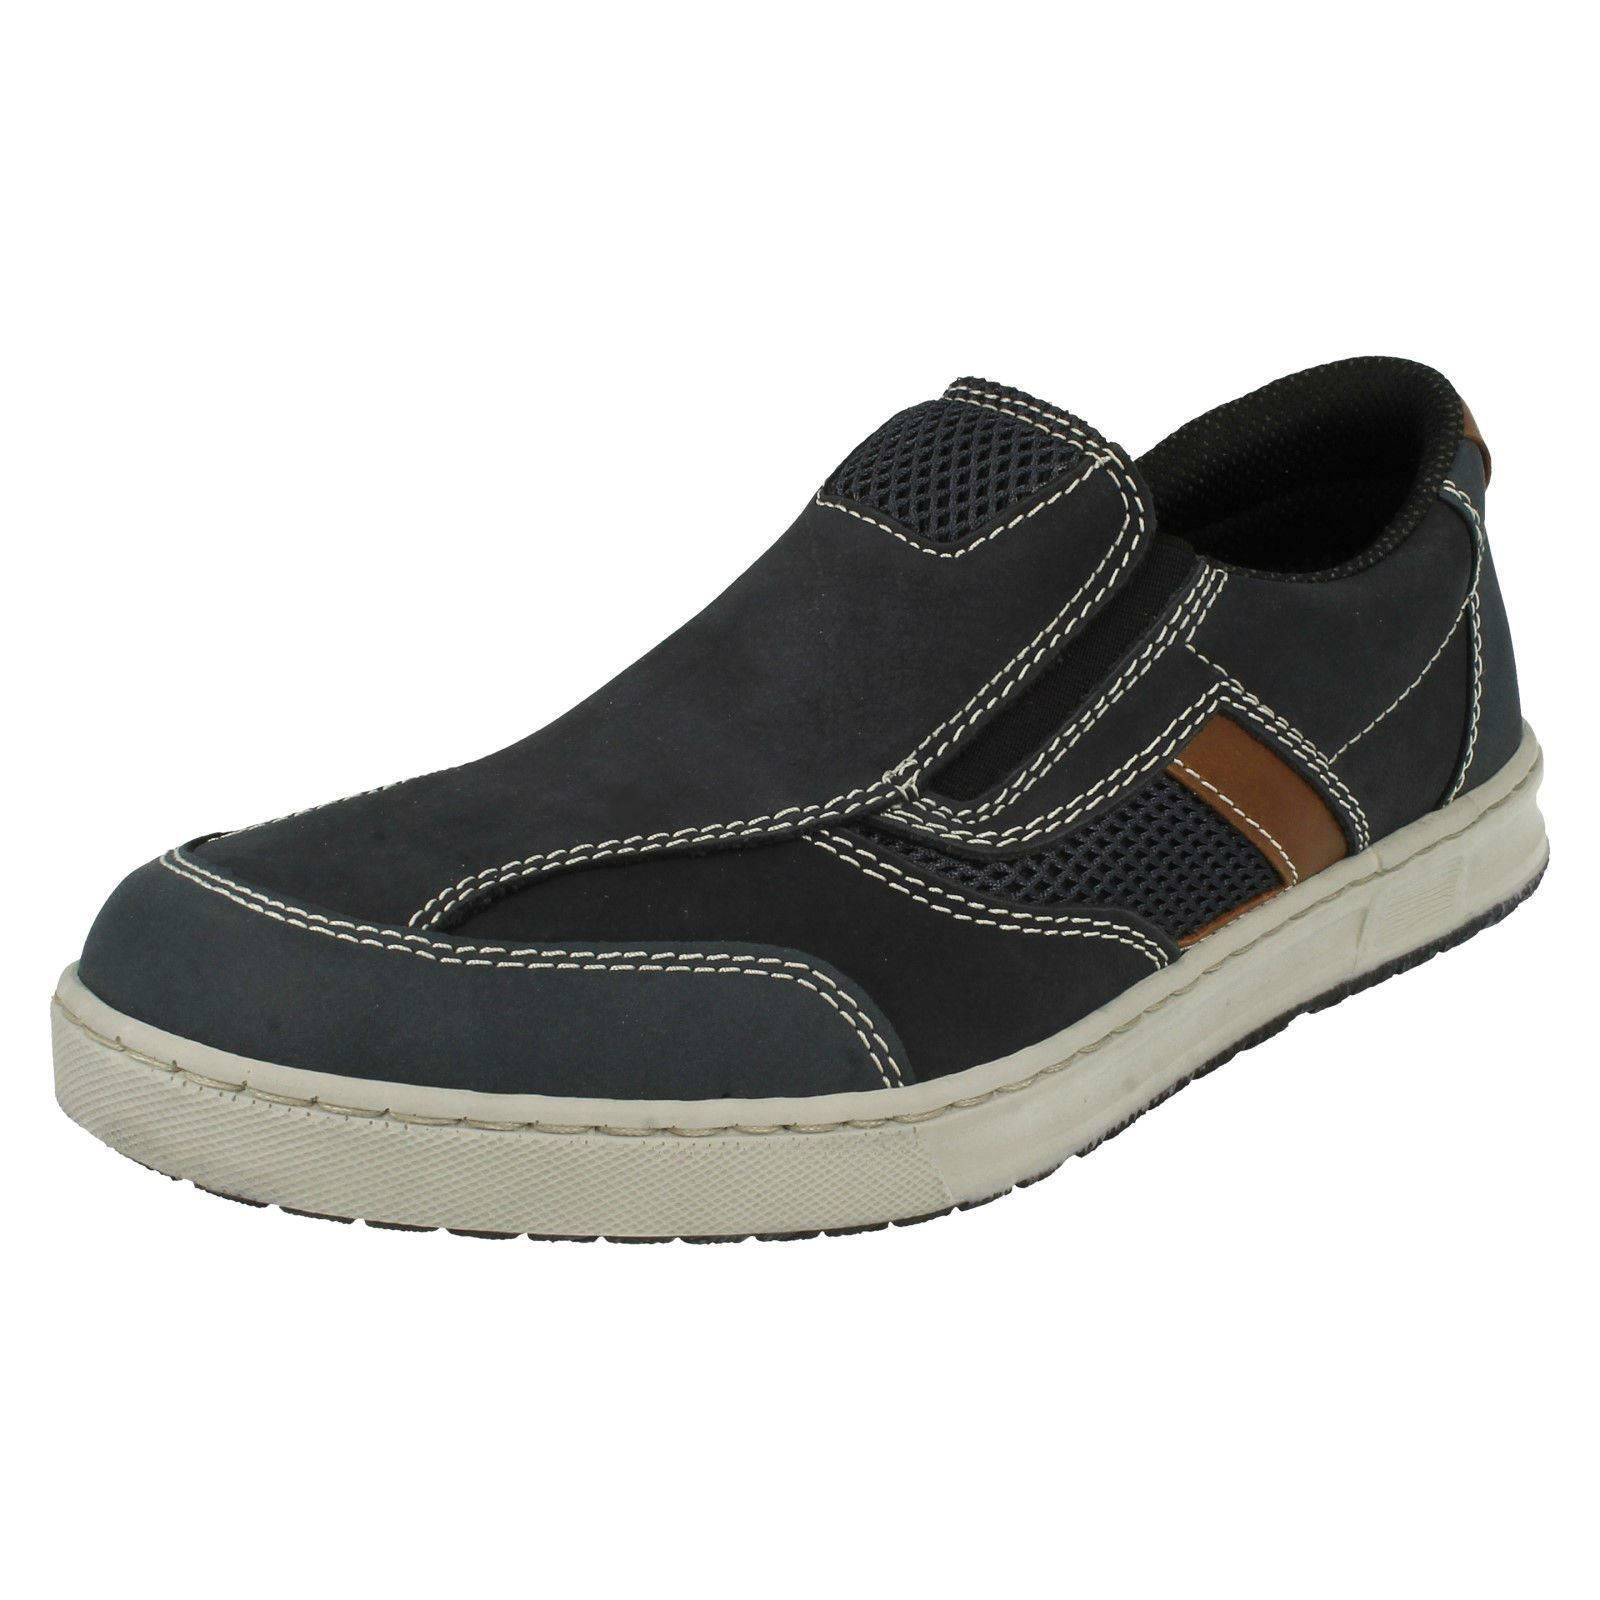 Uomo Rieker Casual Schuhes Schuhes Casual B3052 f5f1c4